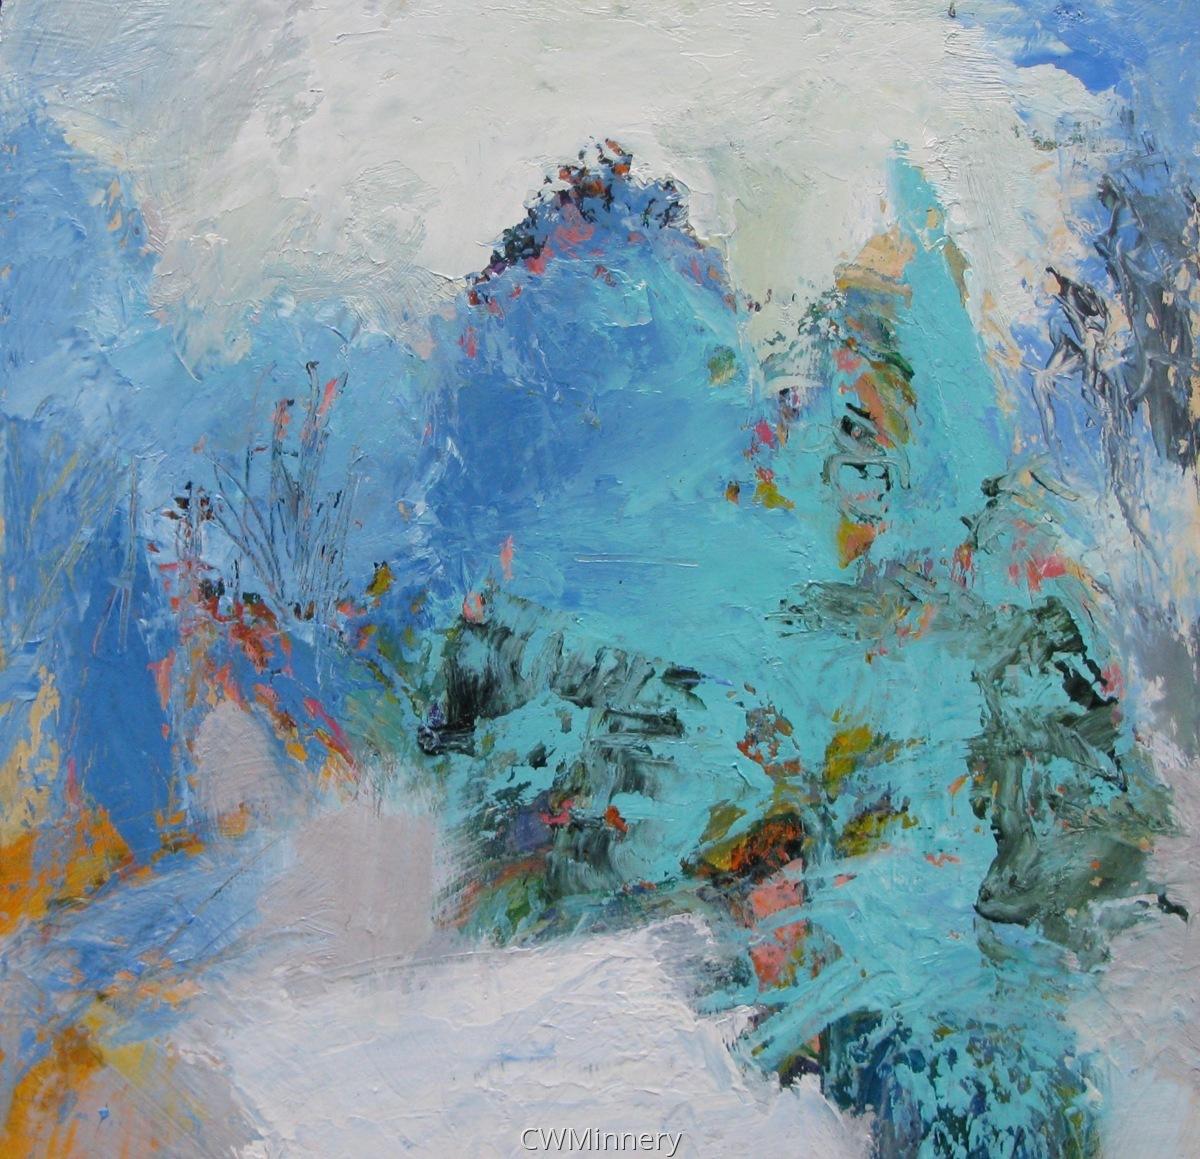 #12 (winter wonderland) (large view)